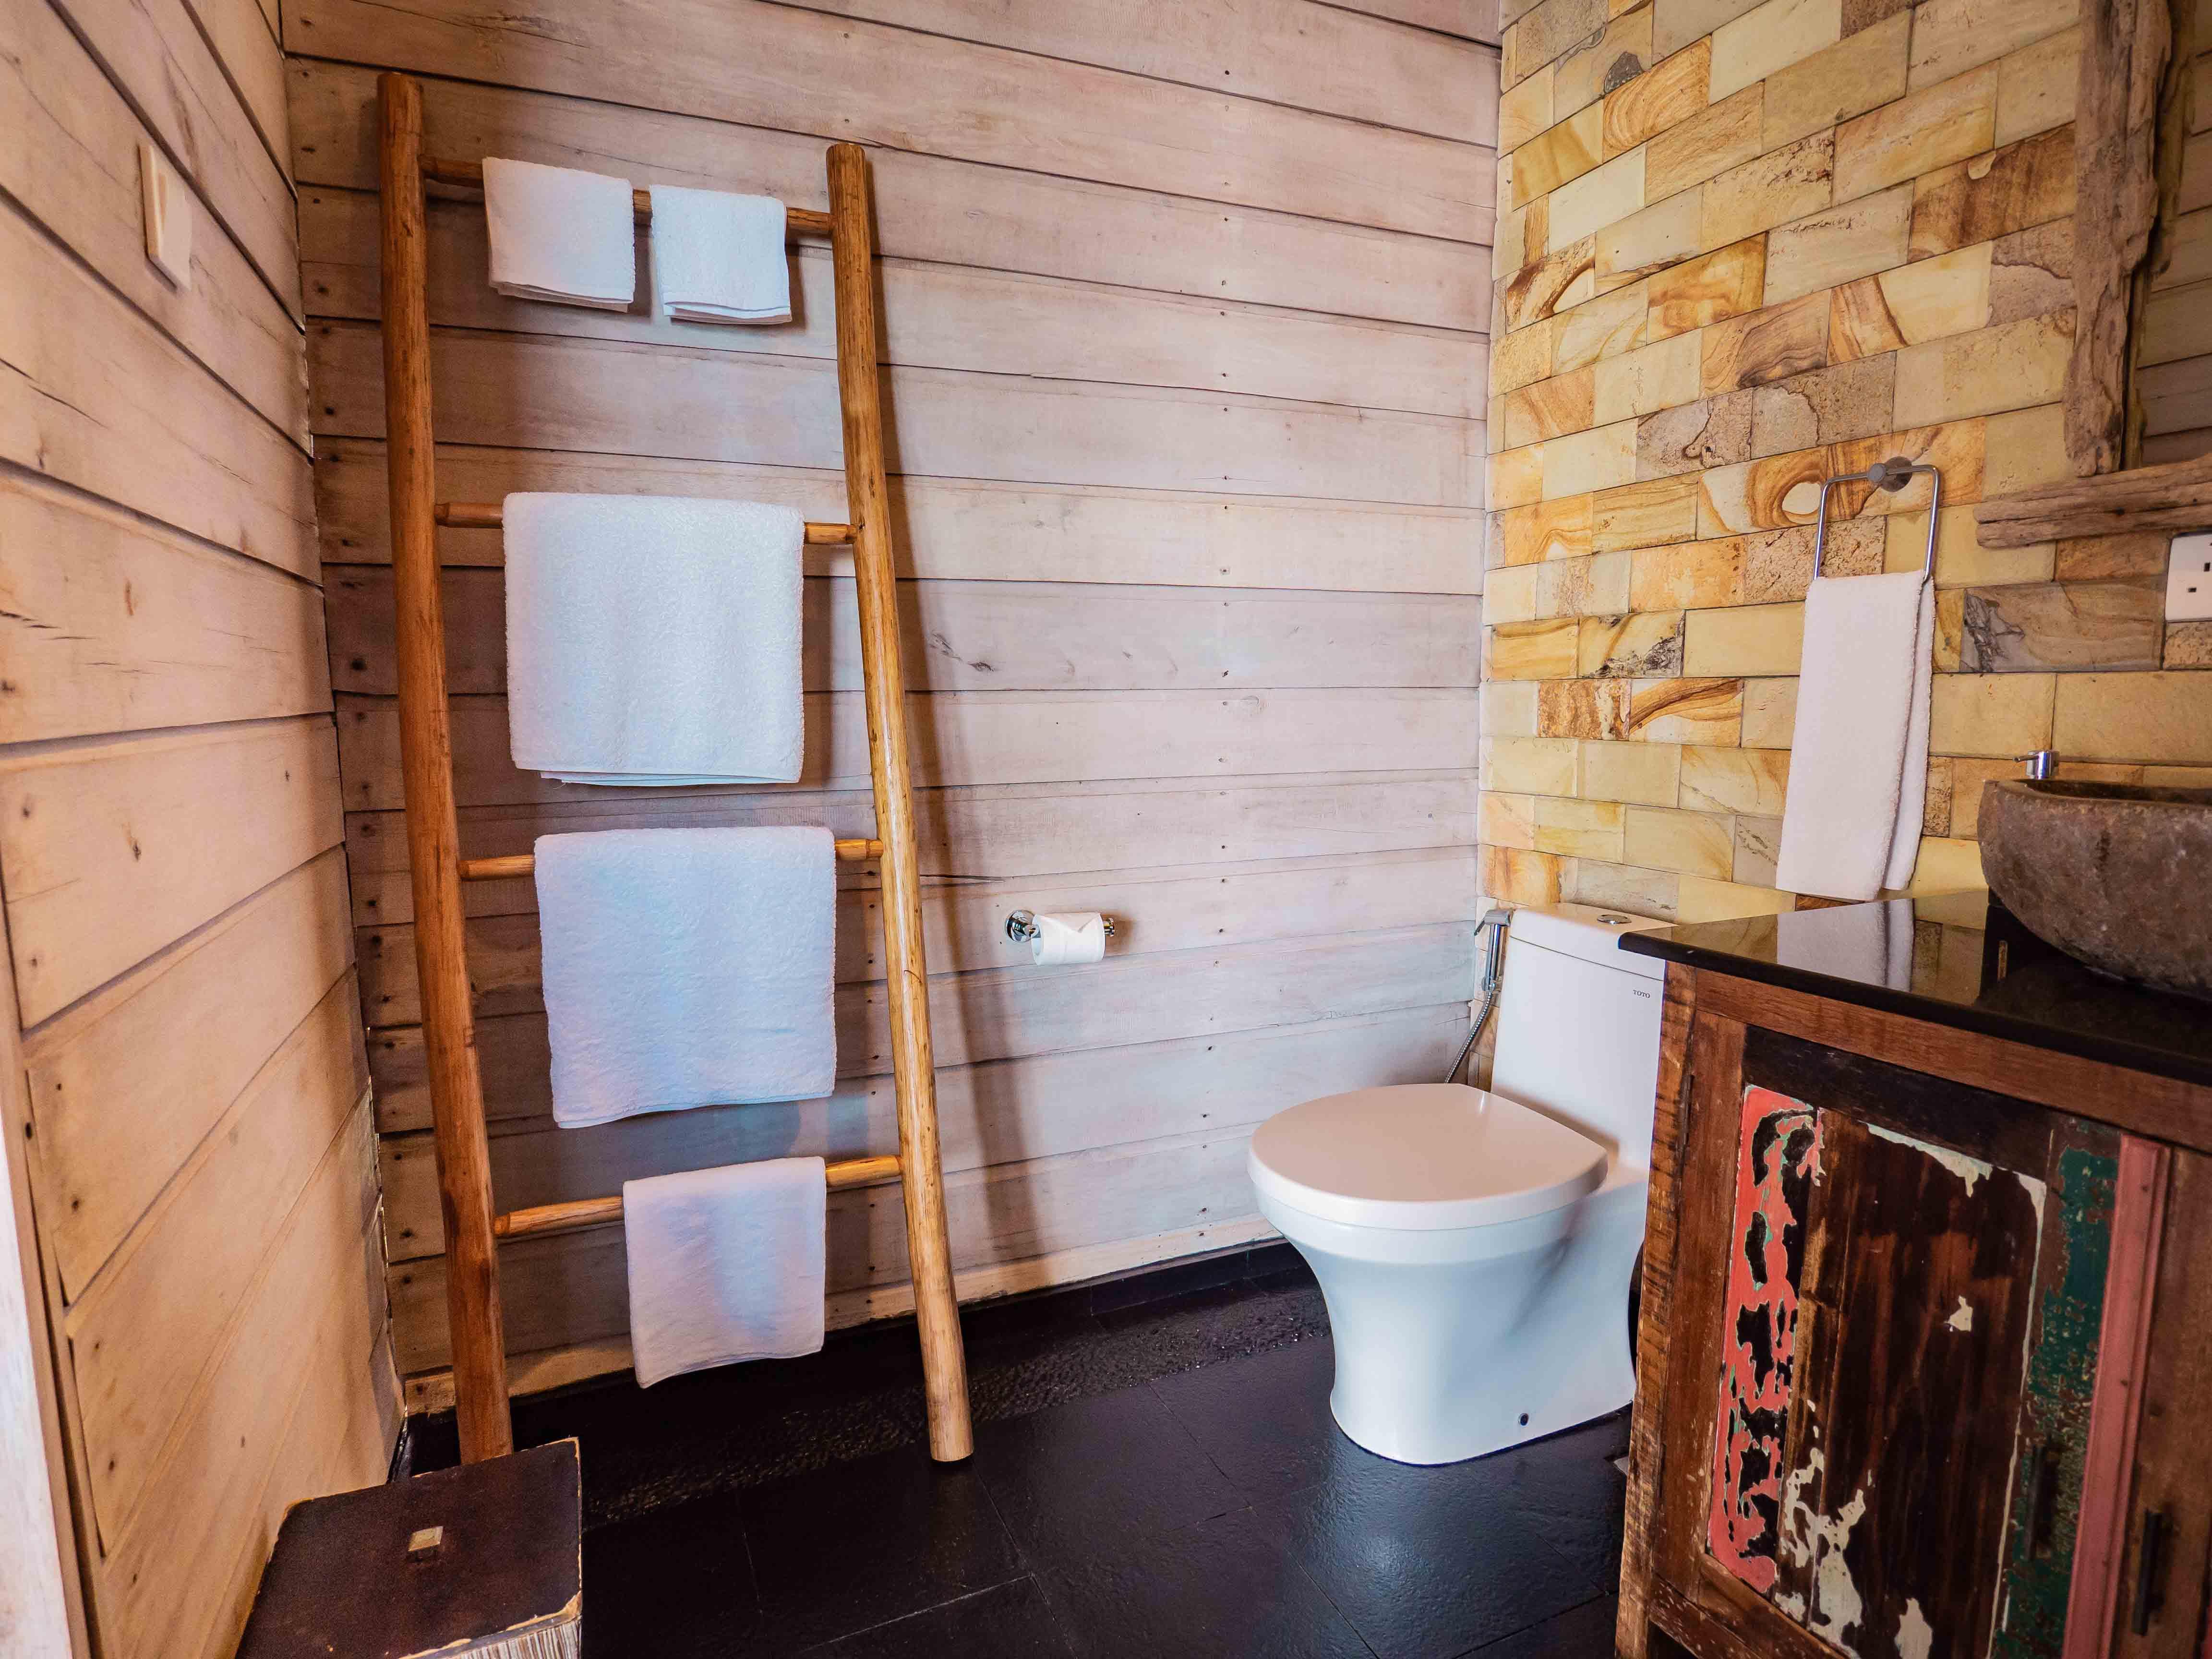 toilet, Telunas Private Island Batam Indonesia, Hotel Review